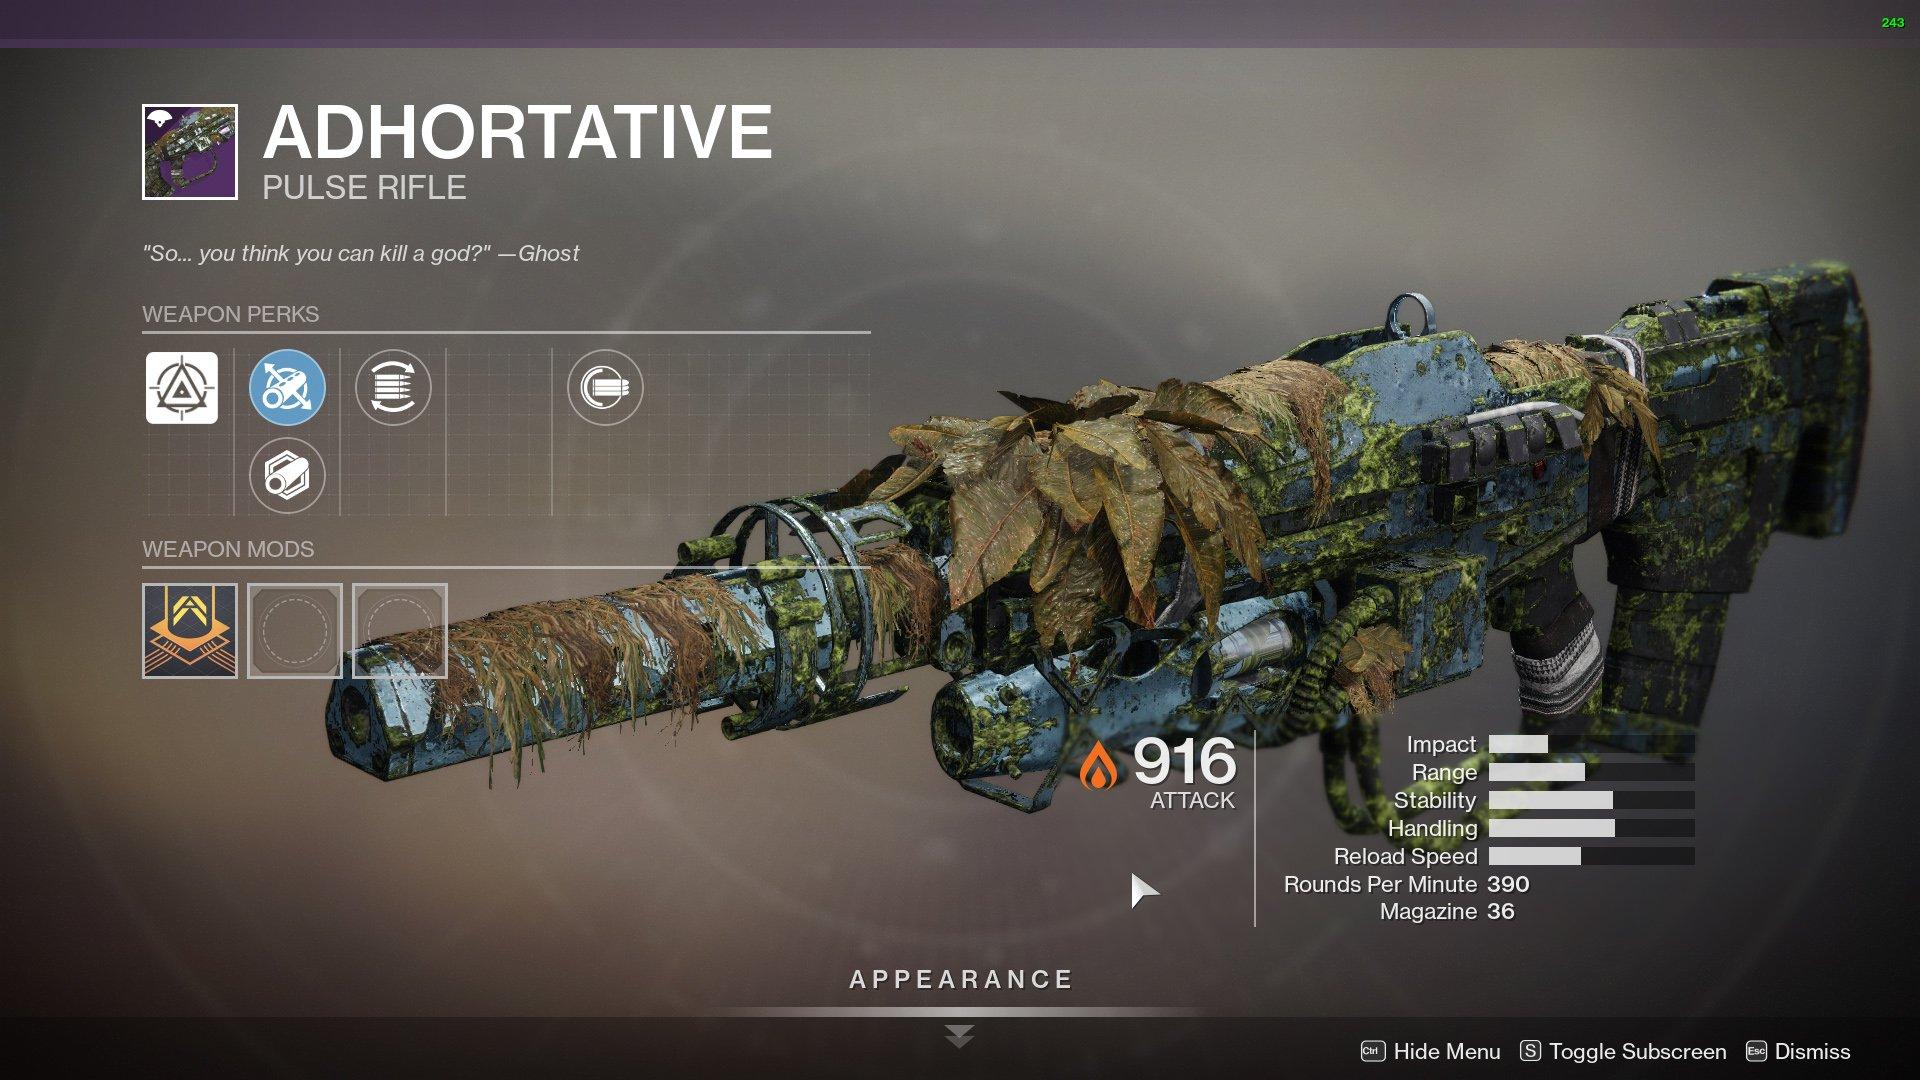 Destiny 2 Adhortative